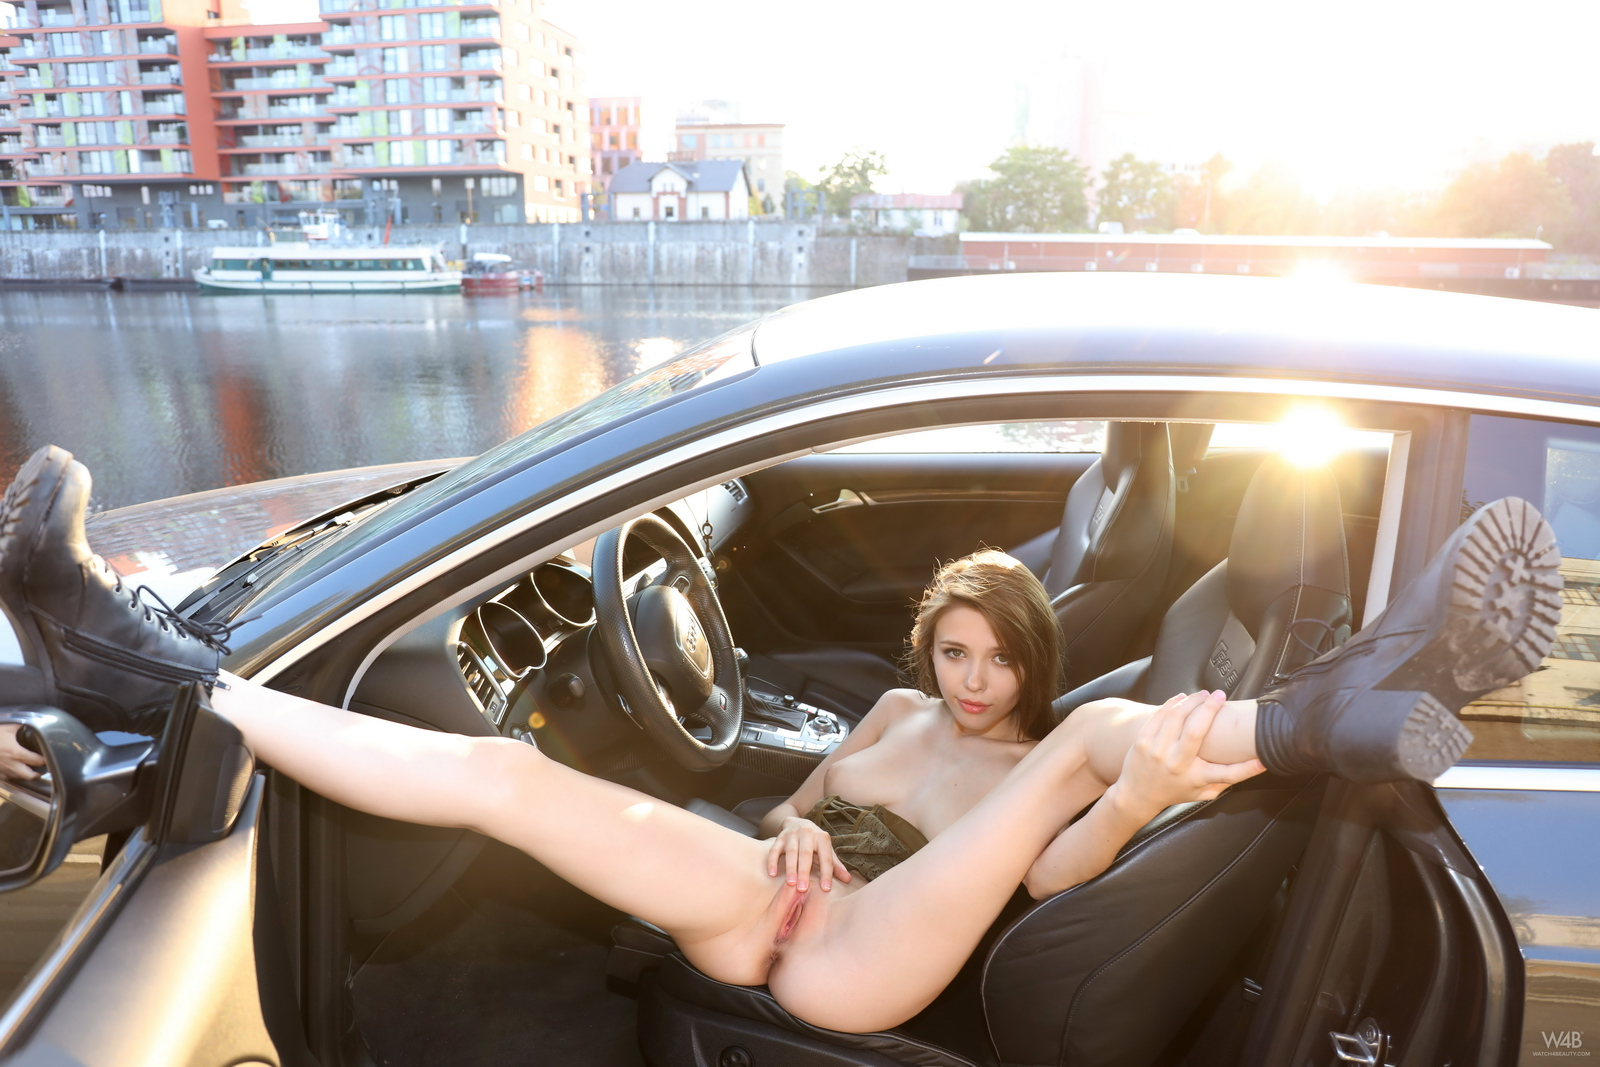 https://redbust.com/stuff/mila-azul-audi-rs5/milla-nude-audi-rs5-cars-pussy-watch4beauty-29.jpg